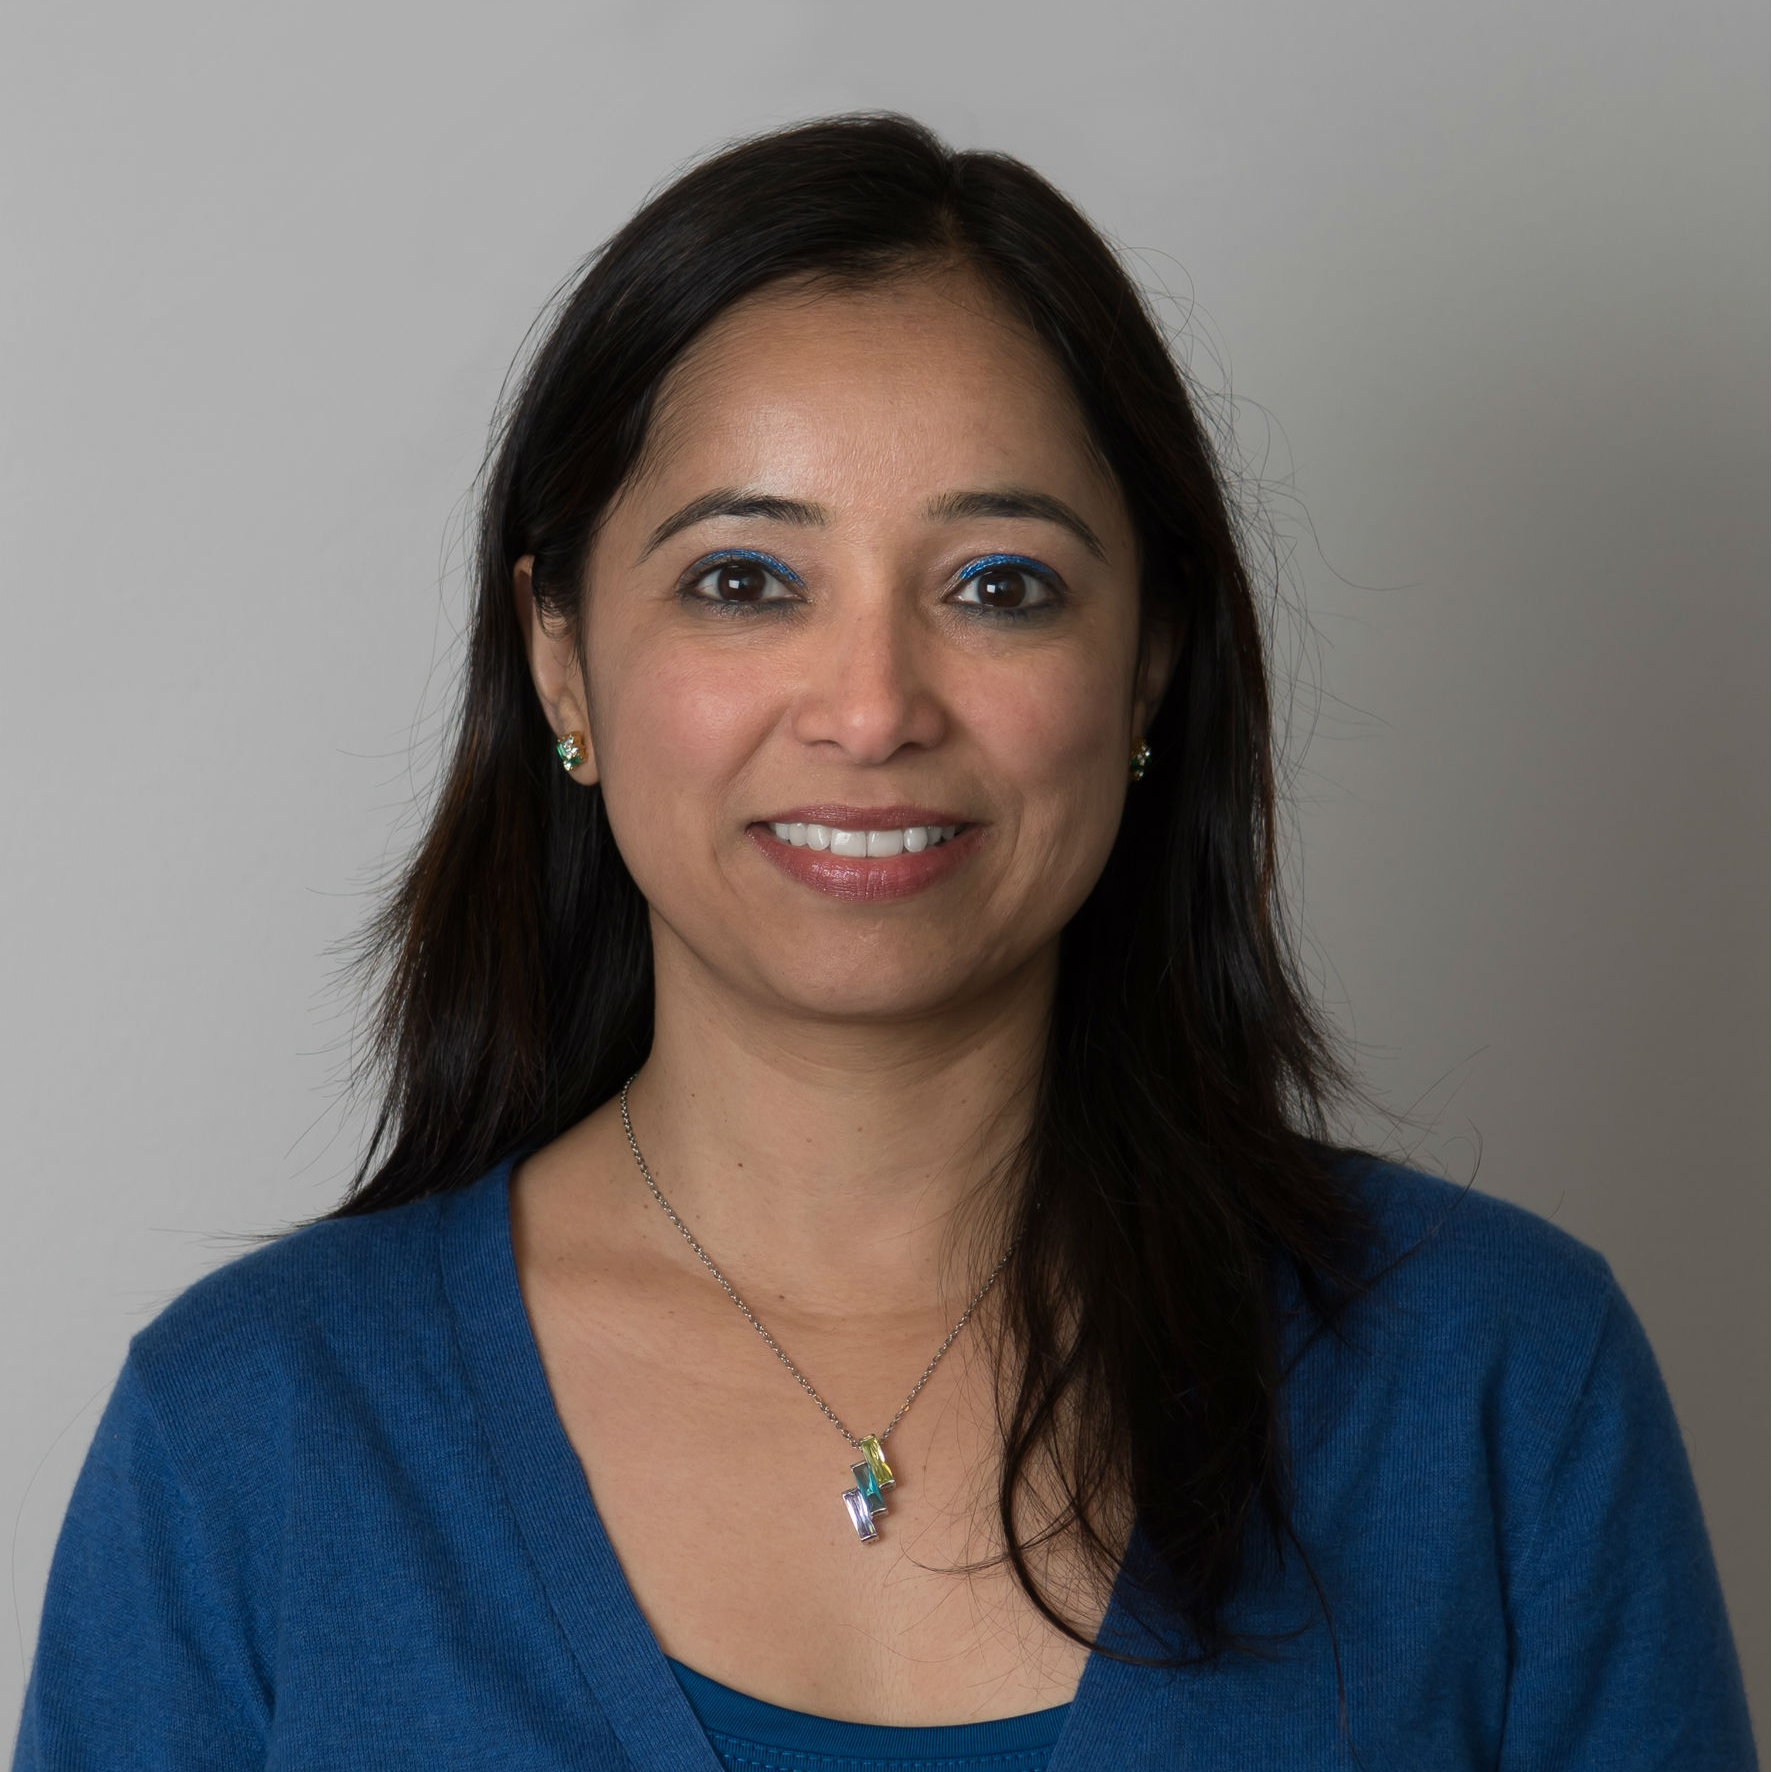 Gauri Trivedi - Administrative Assistantgauri@medconnectpro.com(503) 922-2160 ext. 311(503) 922-2161 (direct)